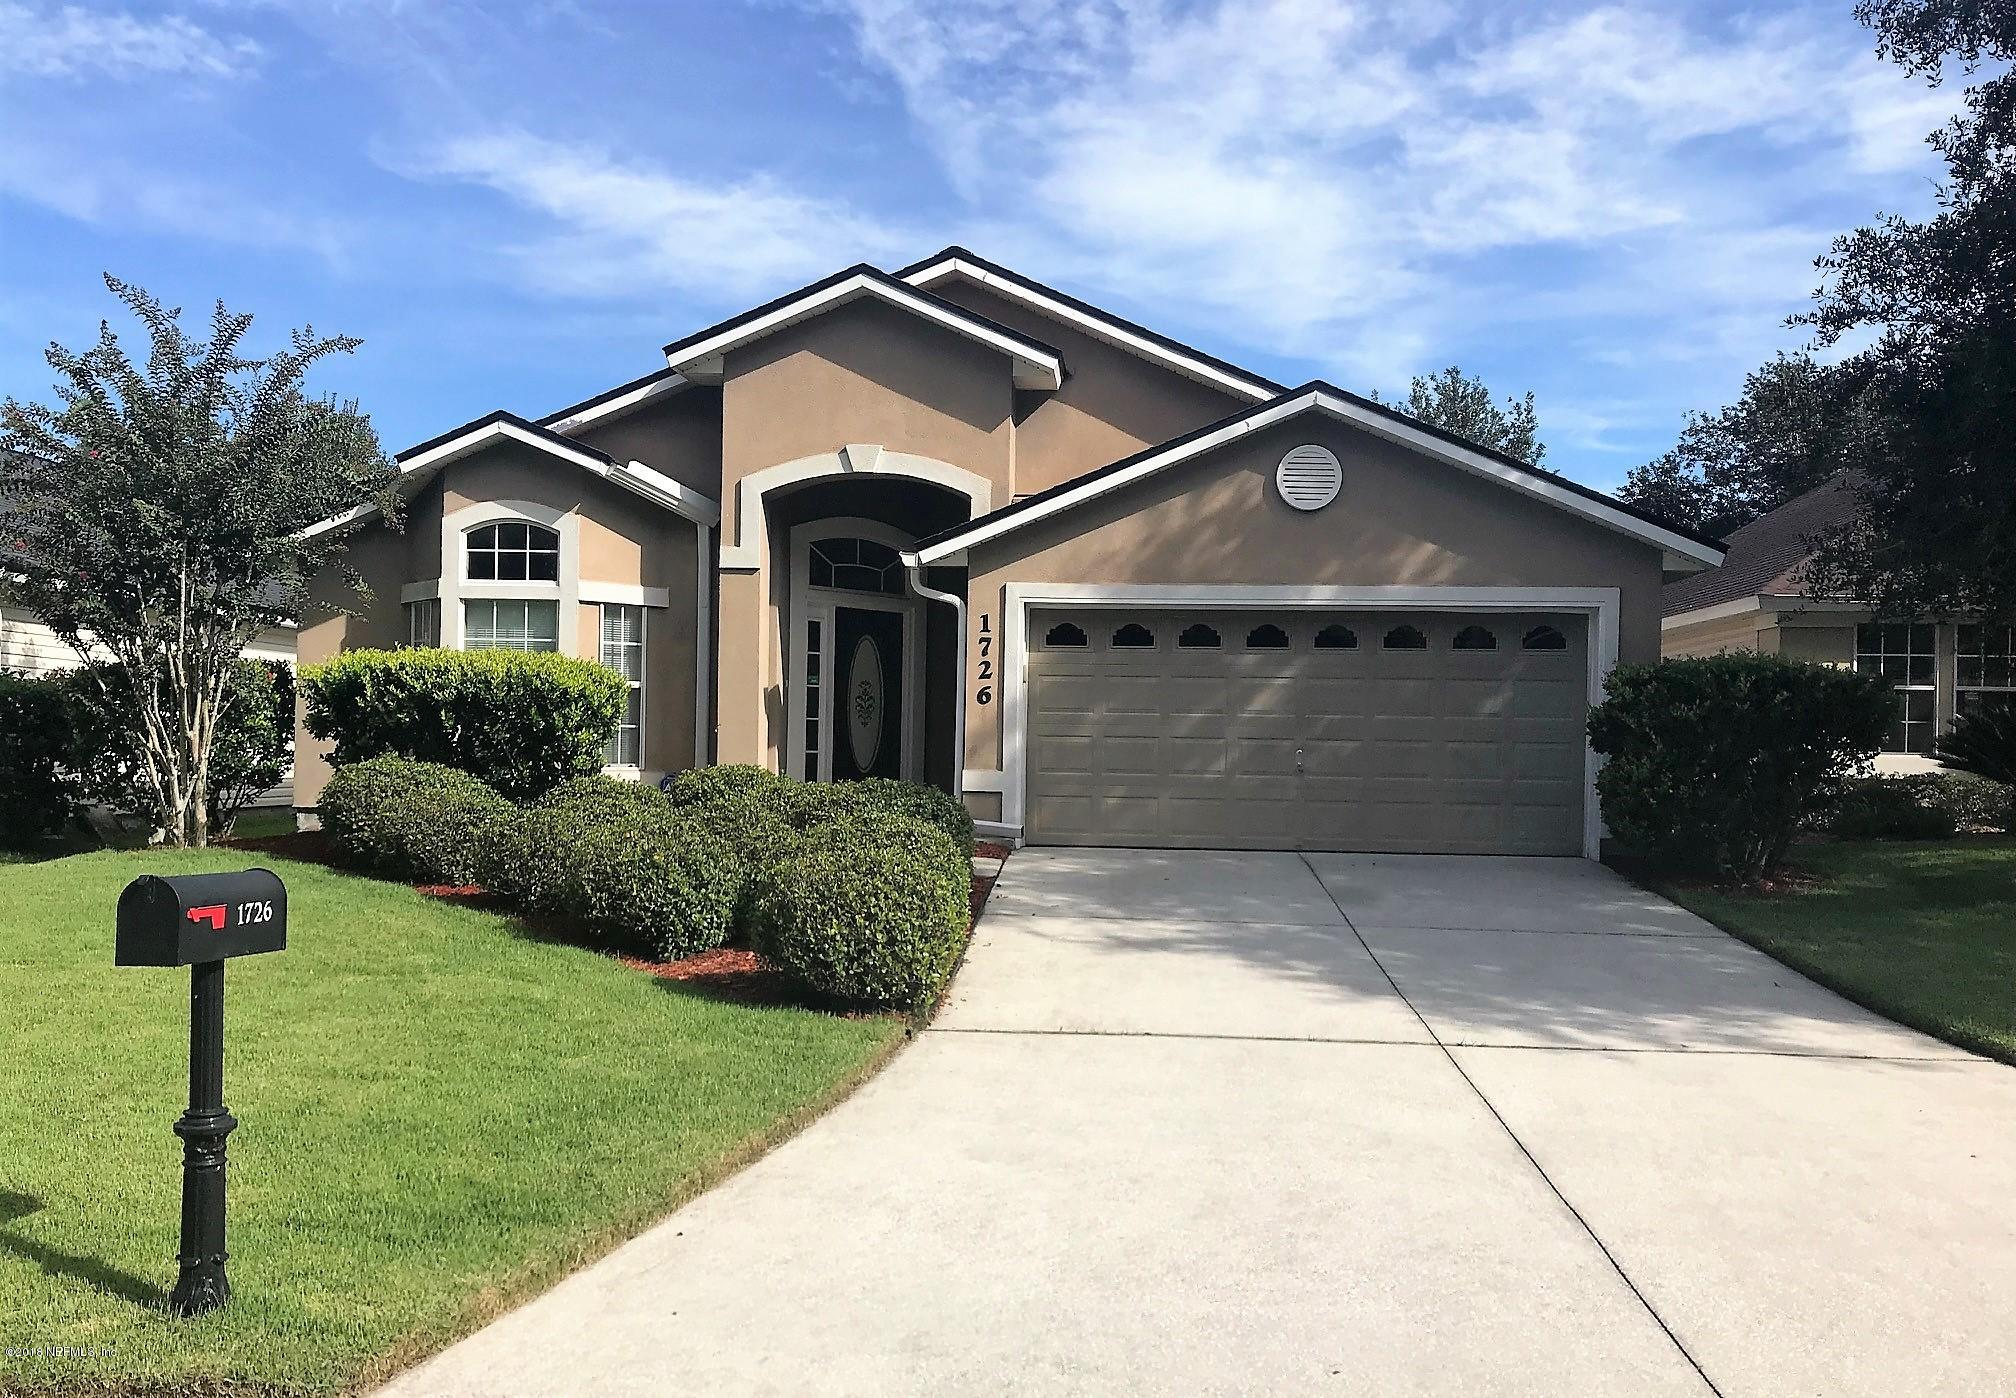 1726 MOSS CREEK, ORANGE PARK, FLORIDA 32003, 3 Bedrooms Bedrooms, ,2 BathroomsBathrooms,Residential - single family,For sale,MOSS CREEK,954908